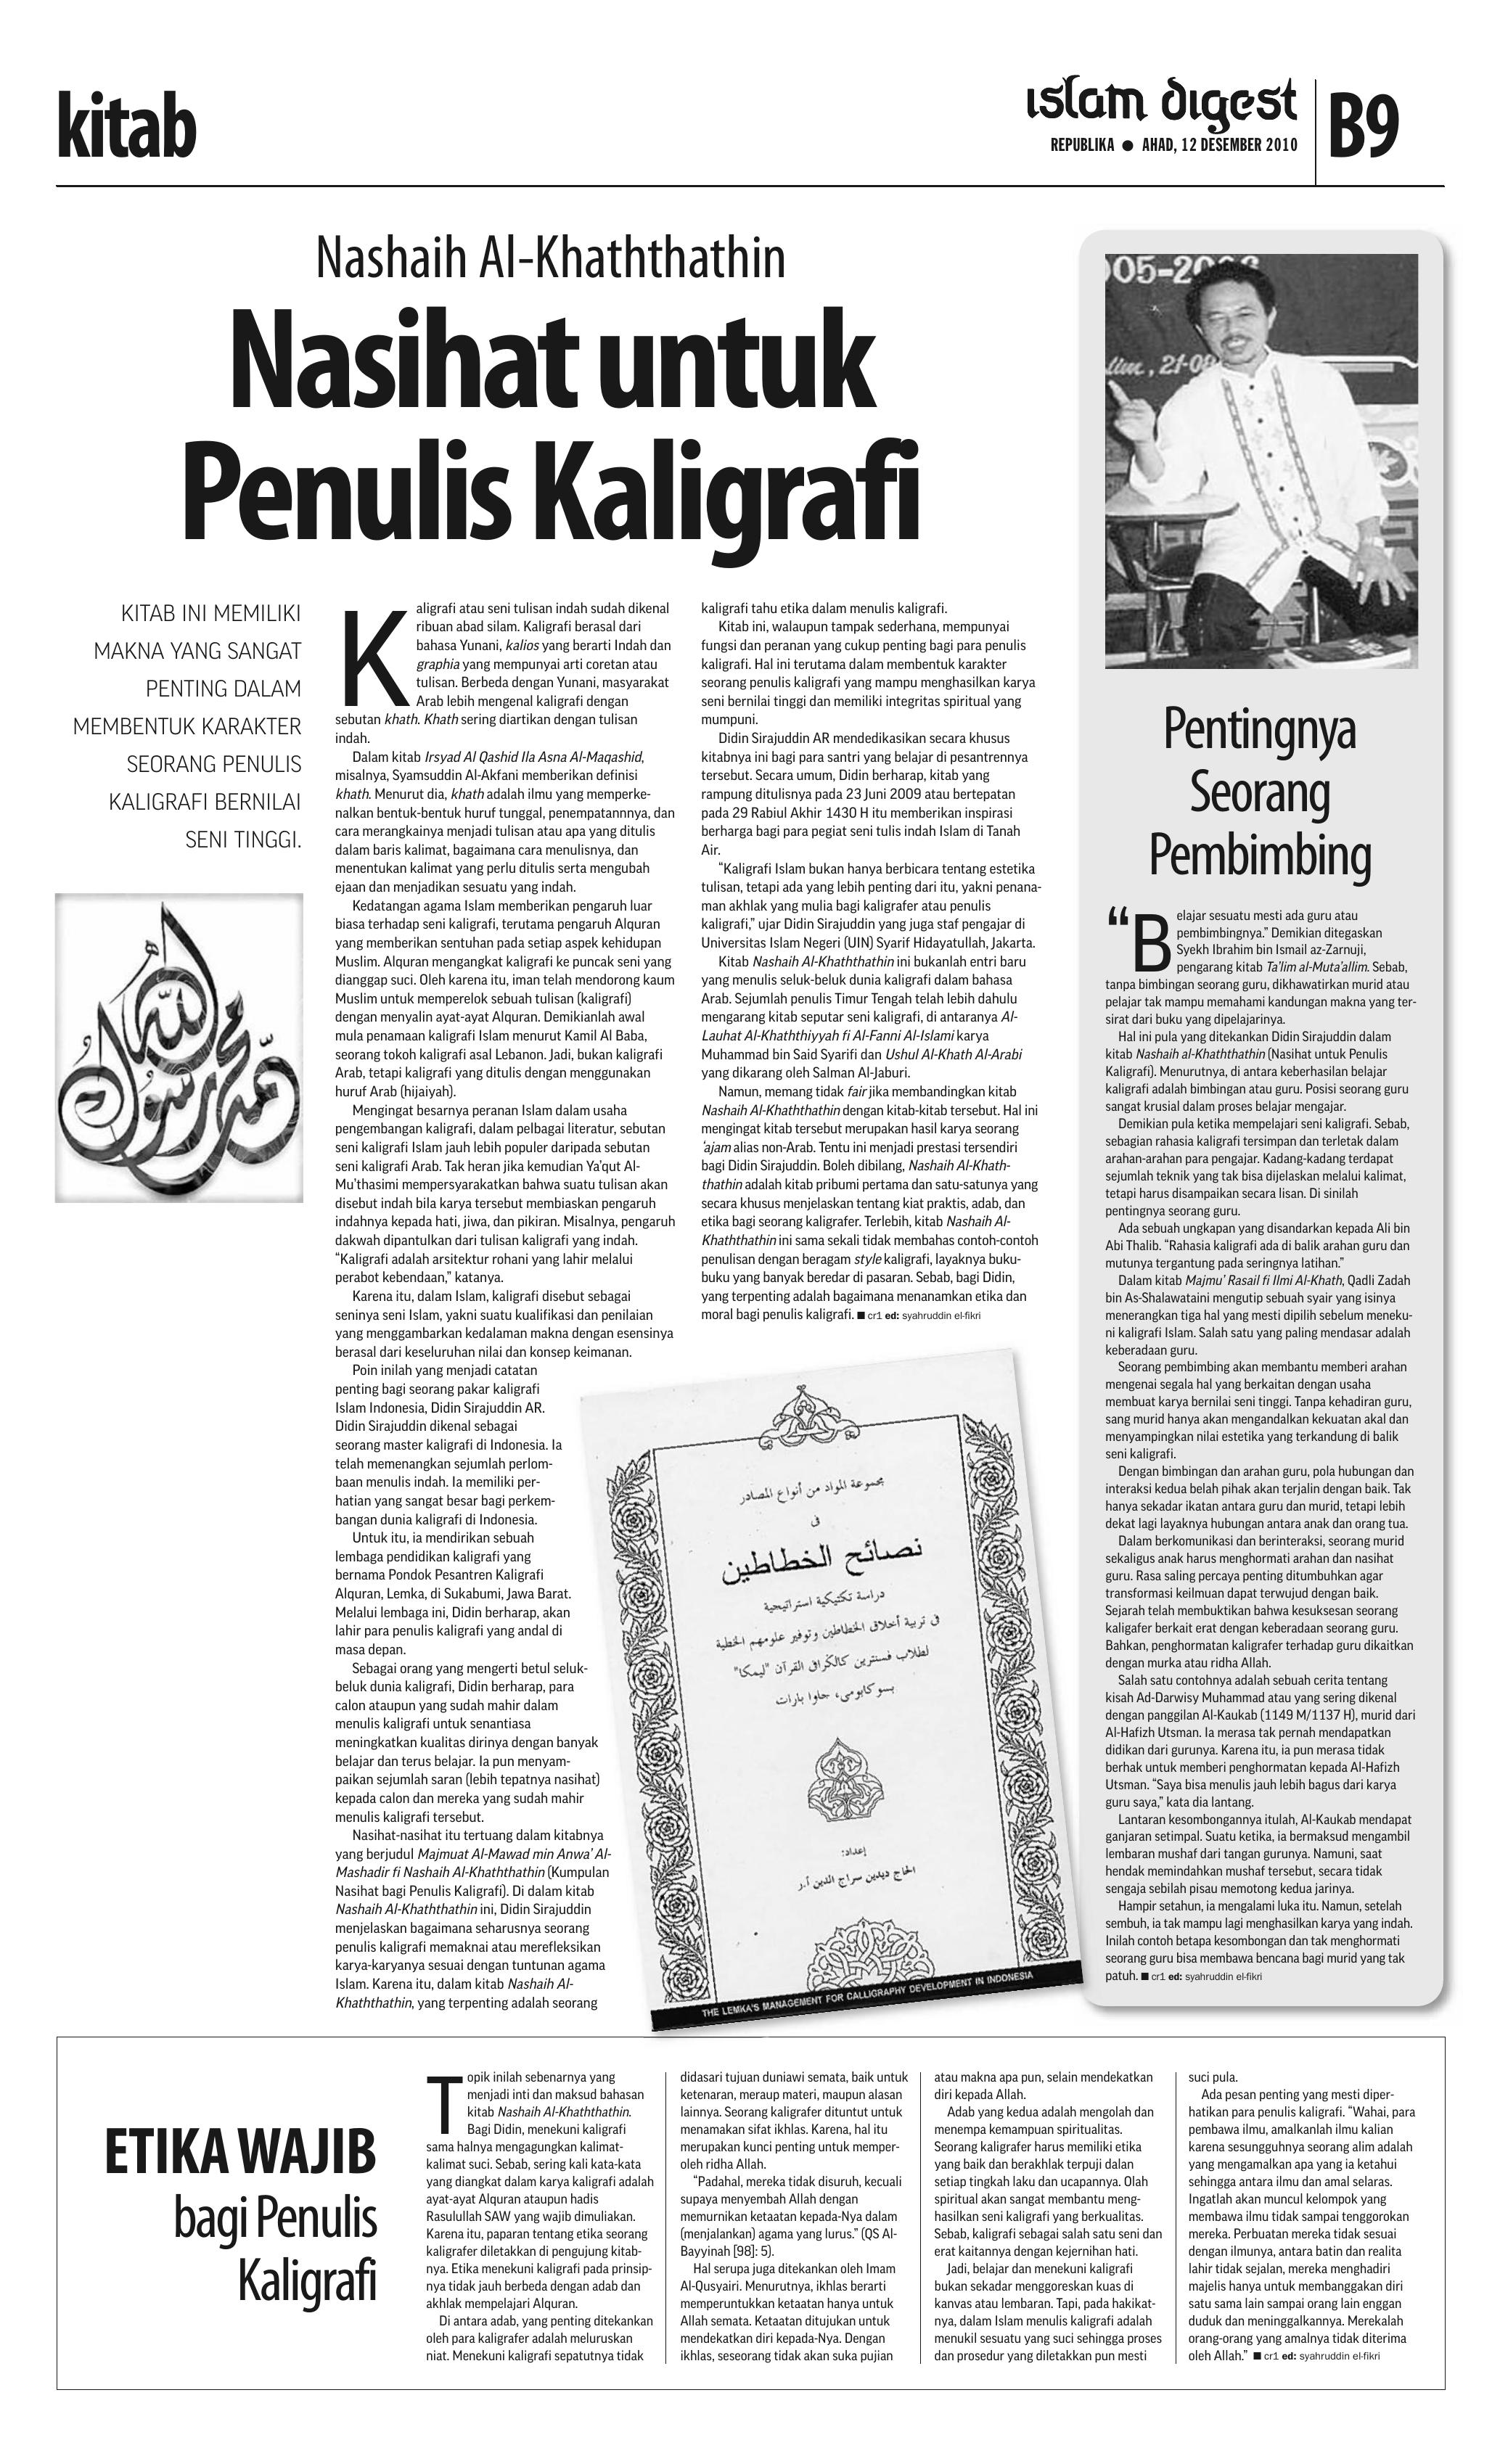 kitab REPUBLIKA â—‹ AHAD 12 DESEMBER 2010 B9 Nashaih Al Khaththathin Nasihat untuk Penulis Kaligrafi KITAB INI MEMILIKI MAKNA YANG SANGAT PENTING DALAM